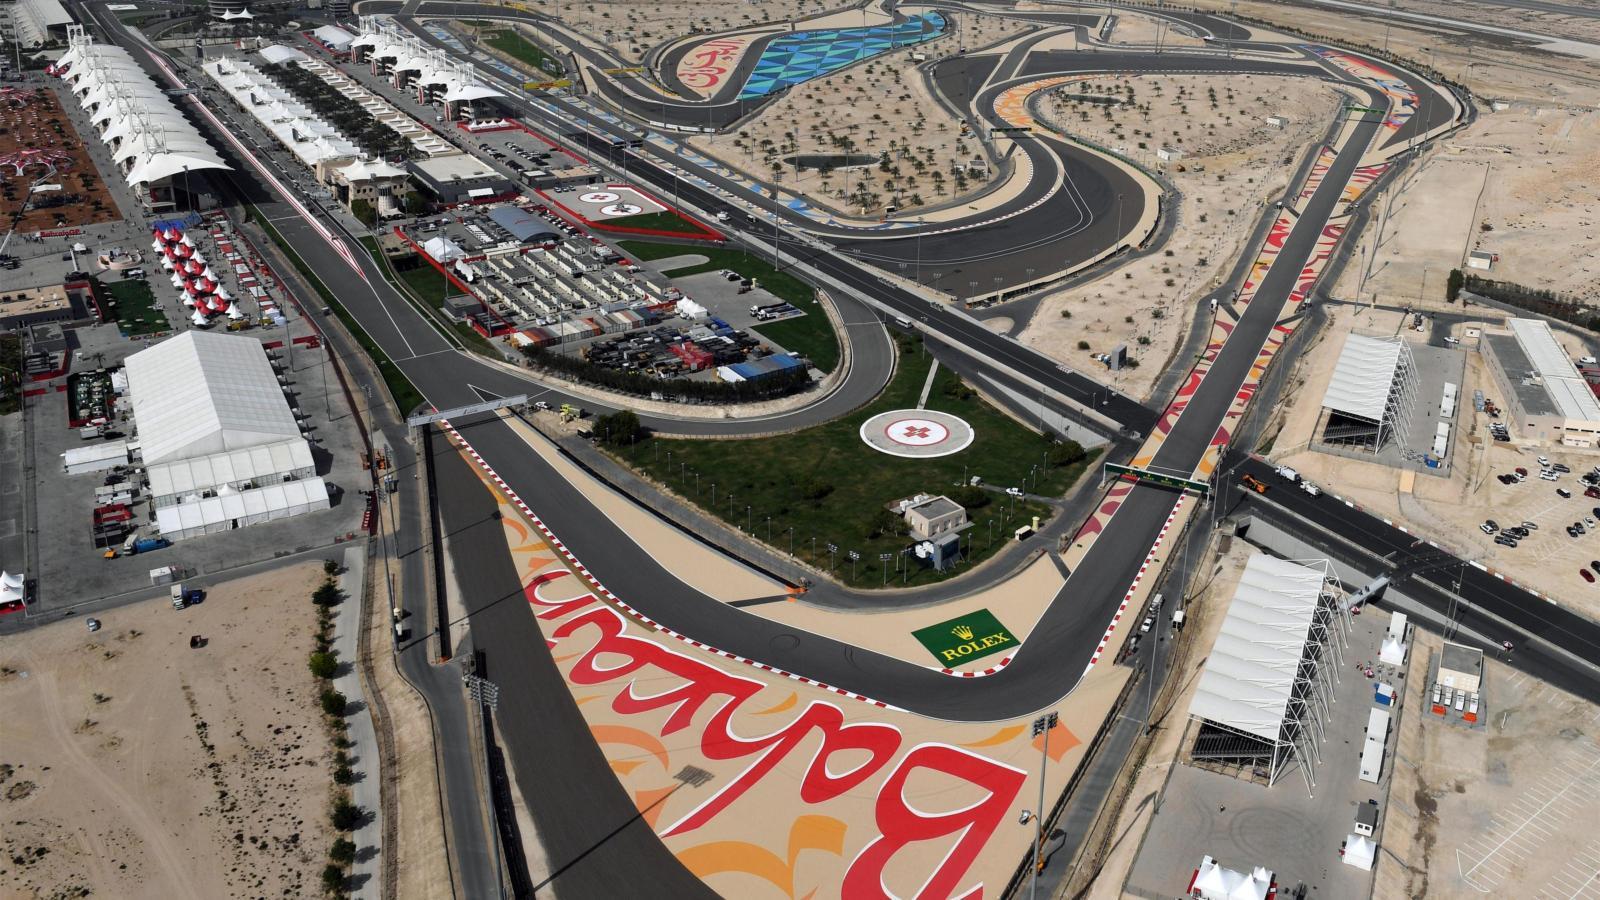 bahrain-grand-prix-2019